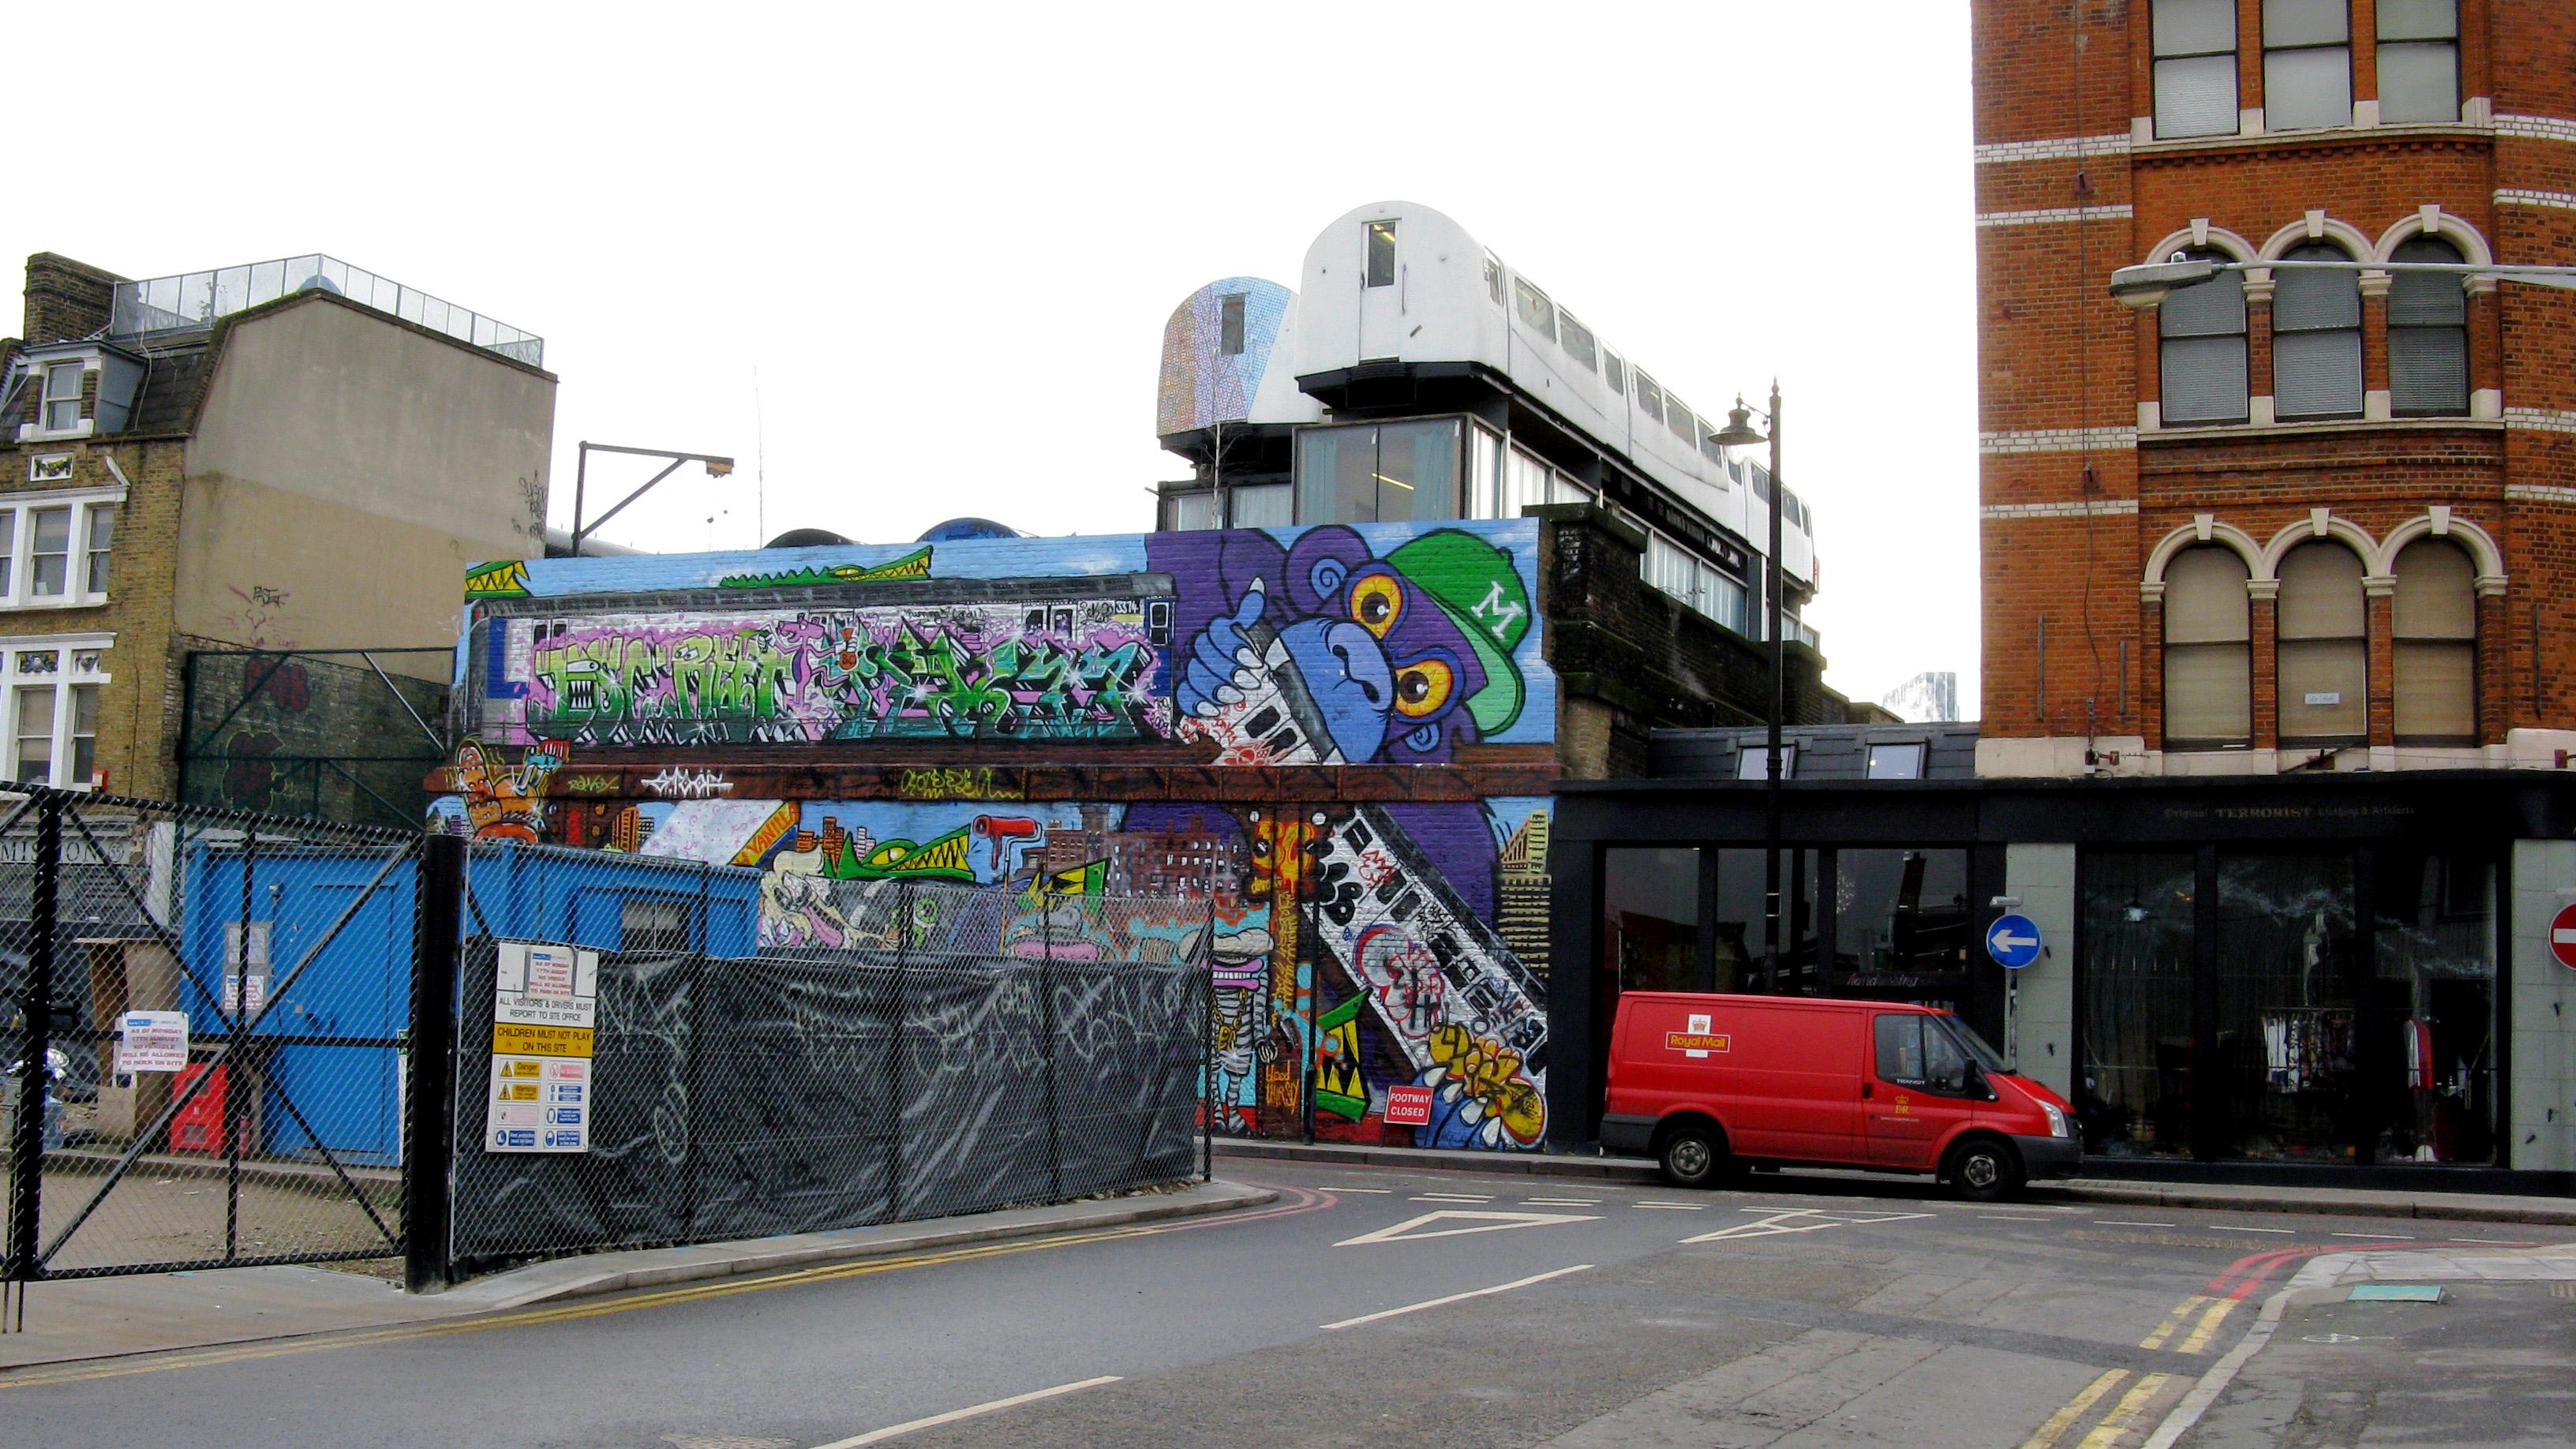 LONDNDrNeilCliftonCCBYSA20